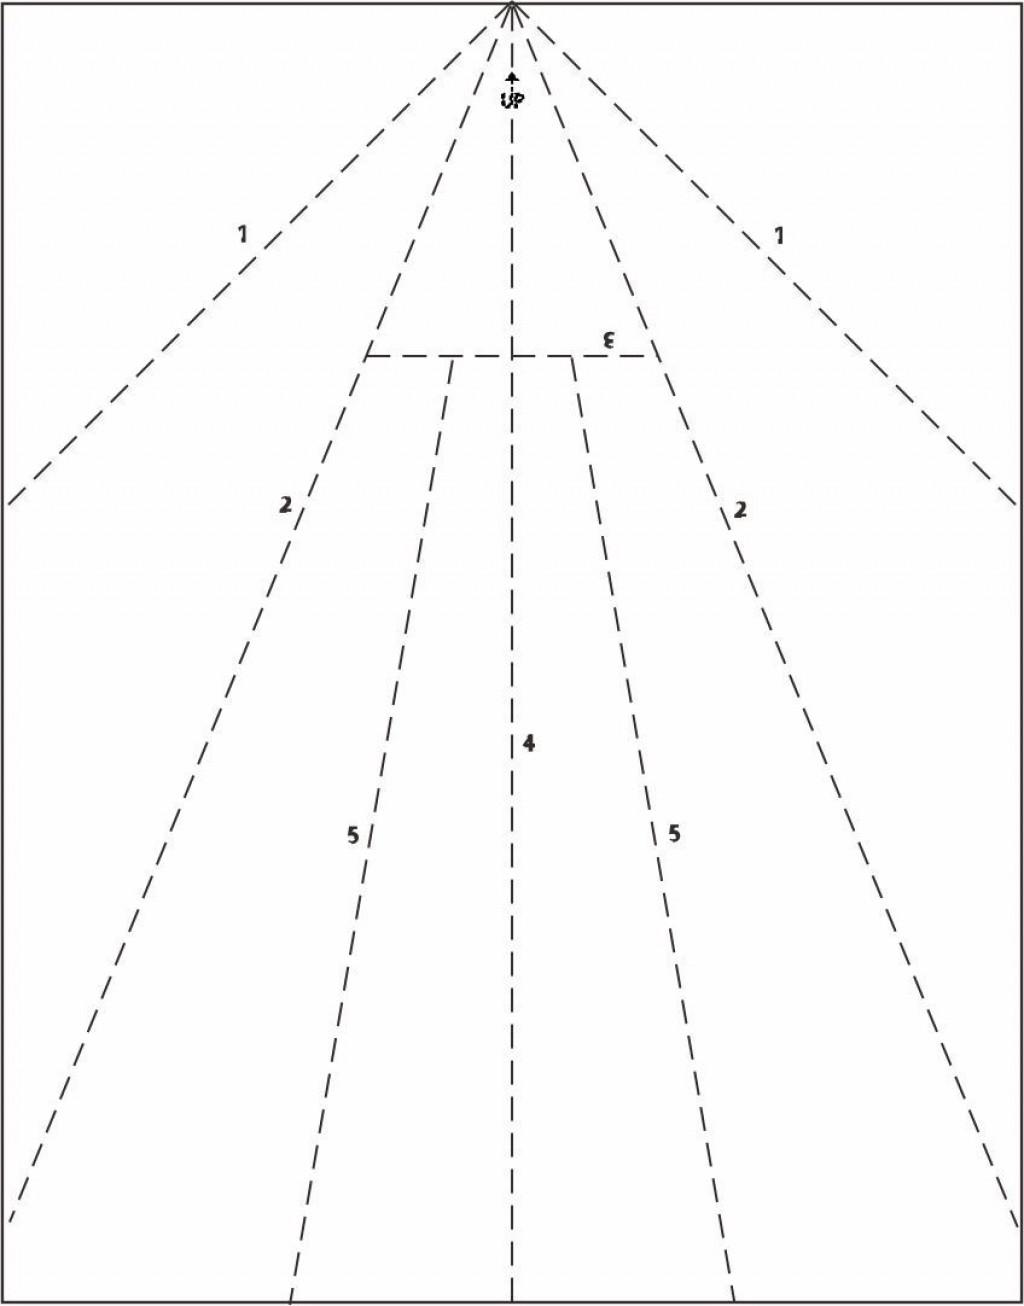 009 Surprising Printable Paper Airplane Pattern Example  Free Plane Design Designs-printable TemplateLarge